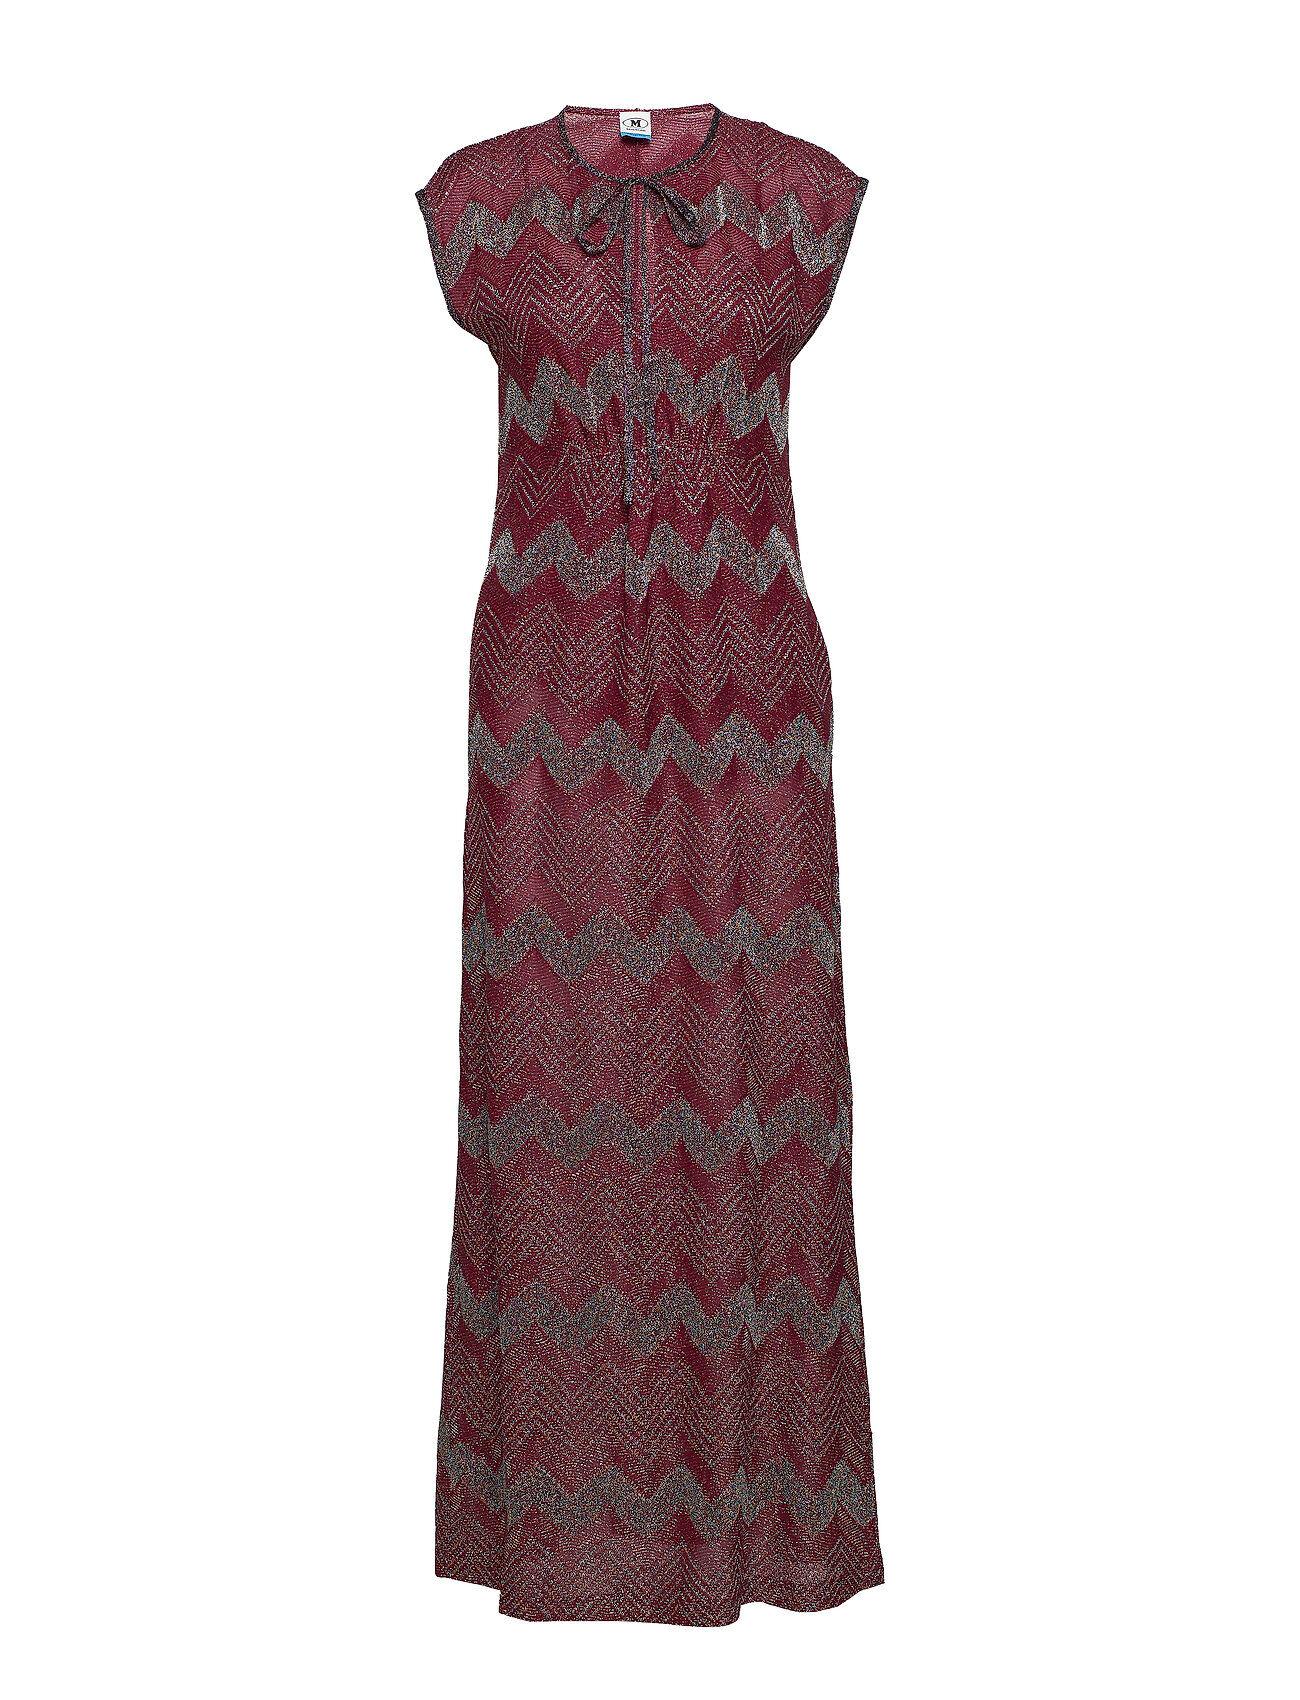 M Missoni Long Dress Maksimekko Juhlamekko Punainen M Missoni